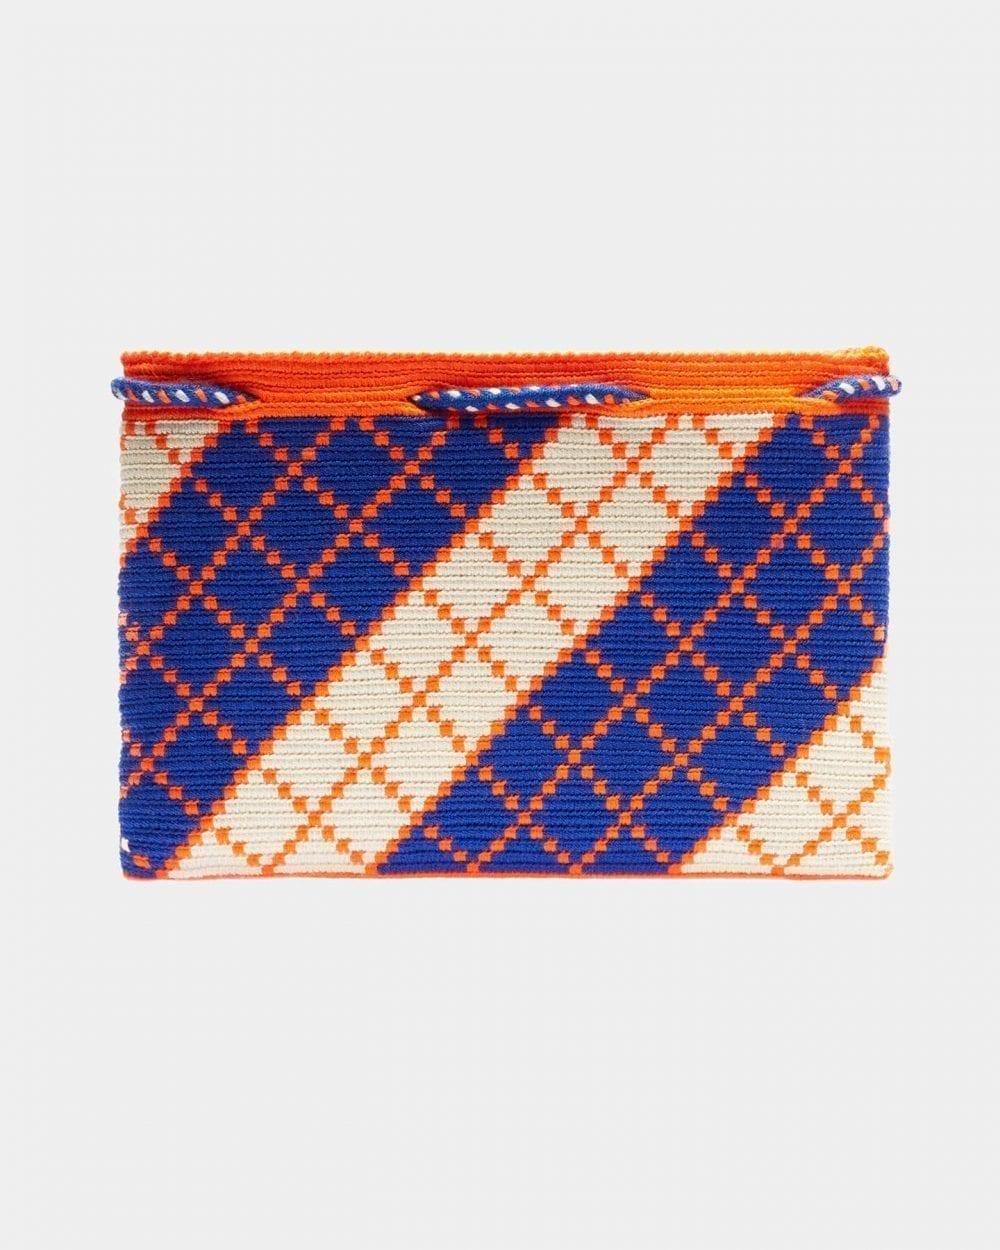 Harmony Blue & Orange clutch by ALLBYB Design, Philadelphia